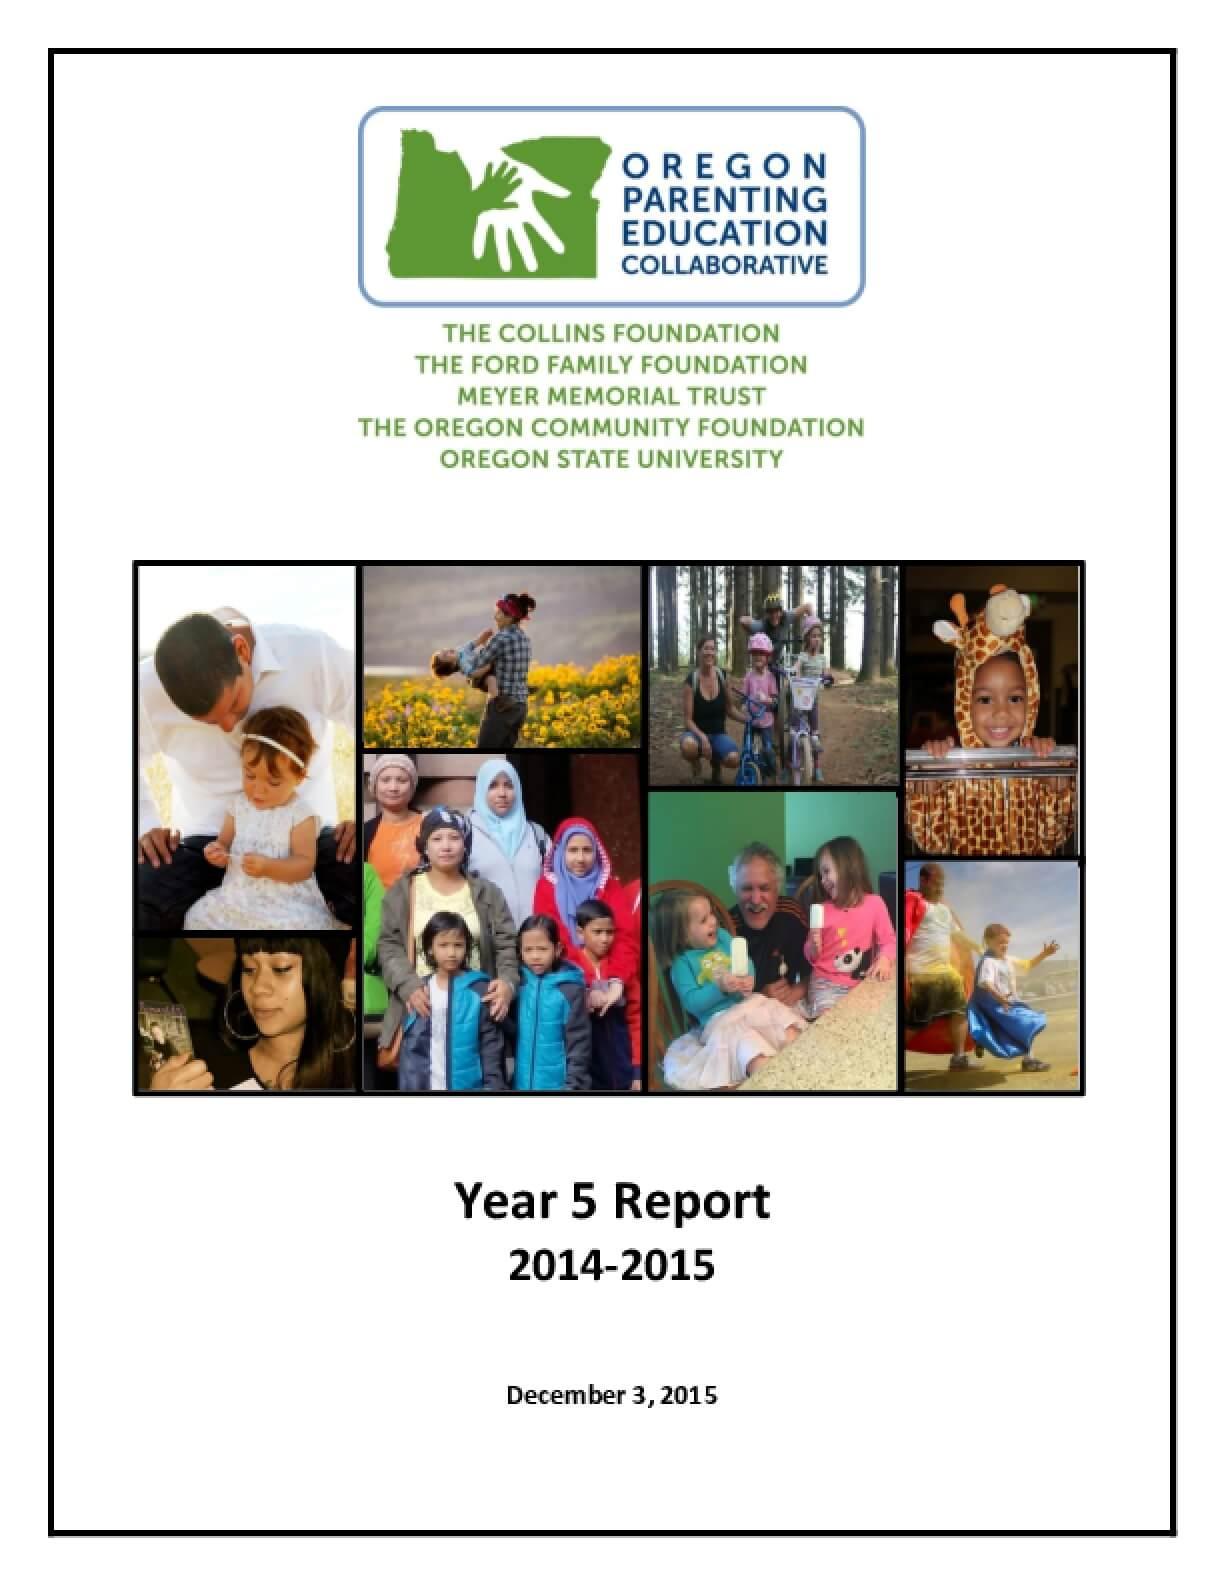 Oregon Parenting Education Collaborative Year 5 Report 2014-2015